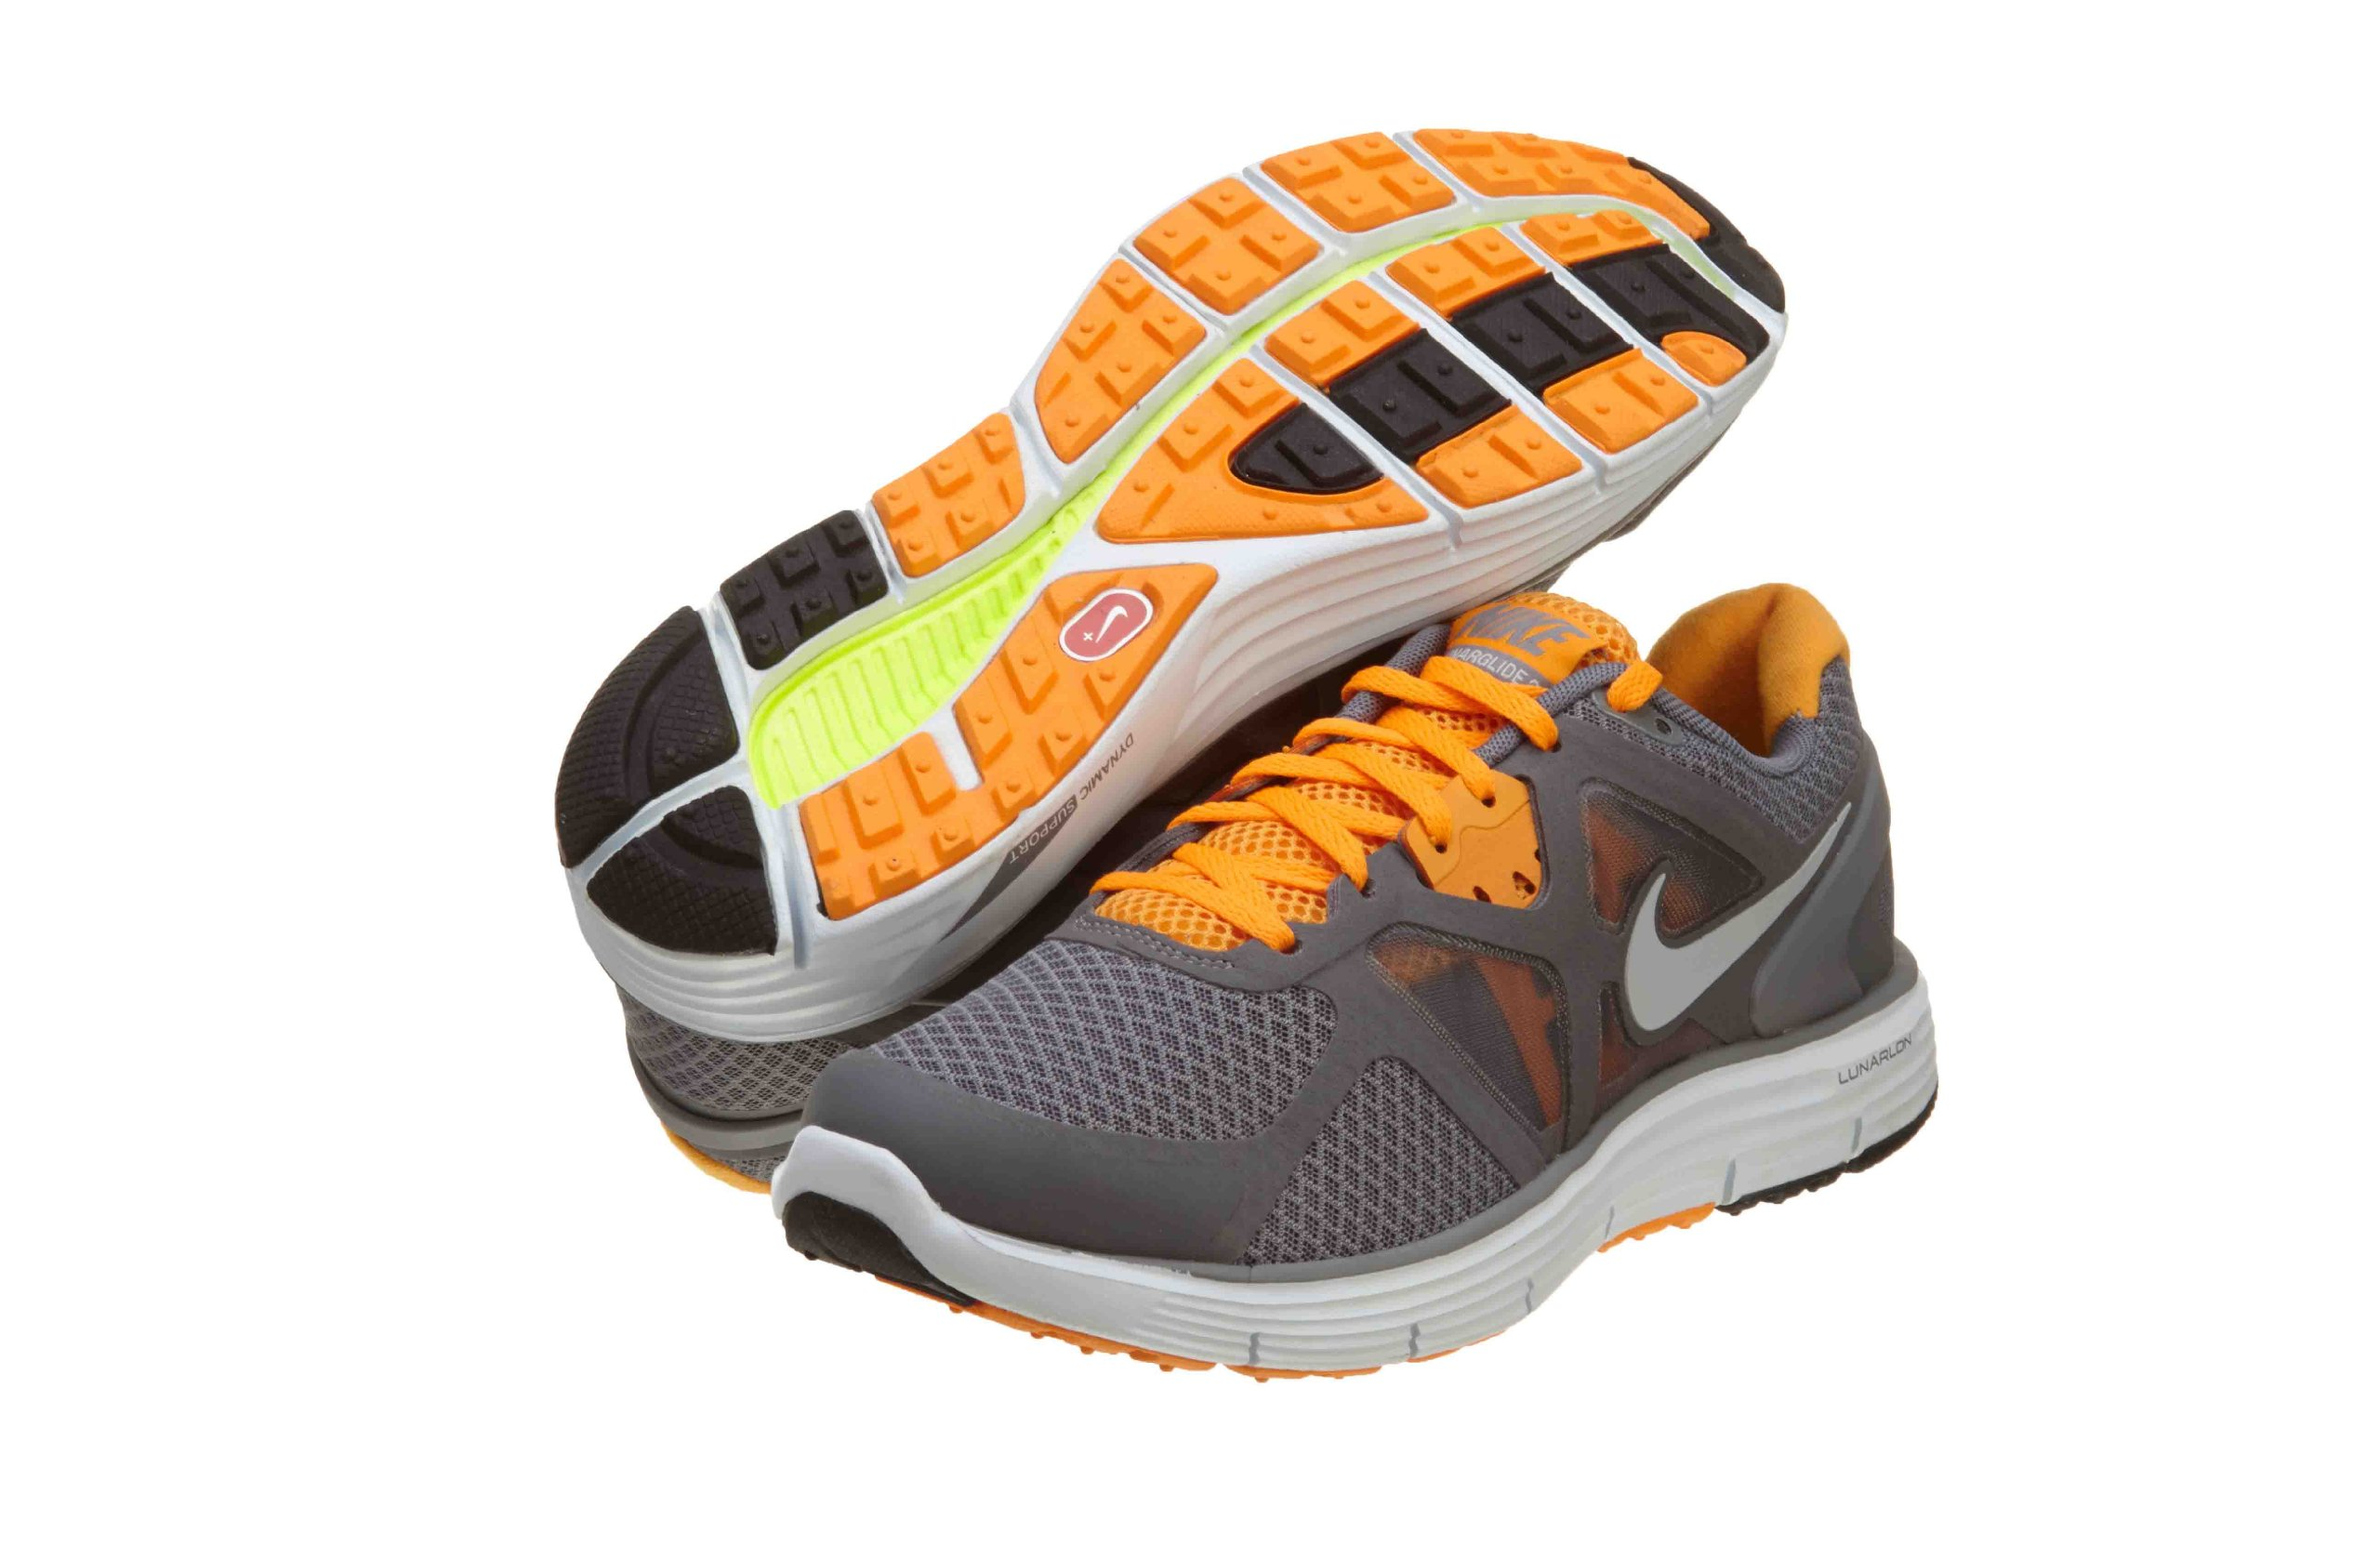 Nike Lunarglide+ 3 Women454315 Style: 454315-008 Size: 9.5 M US by NIKE